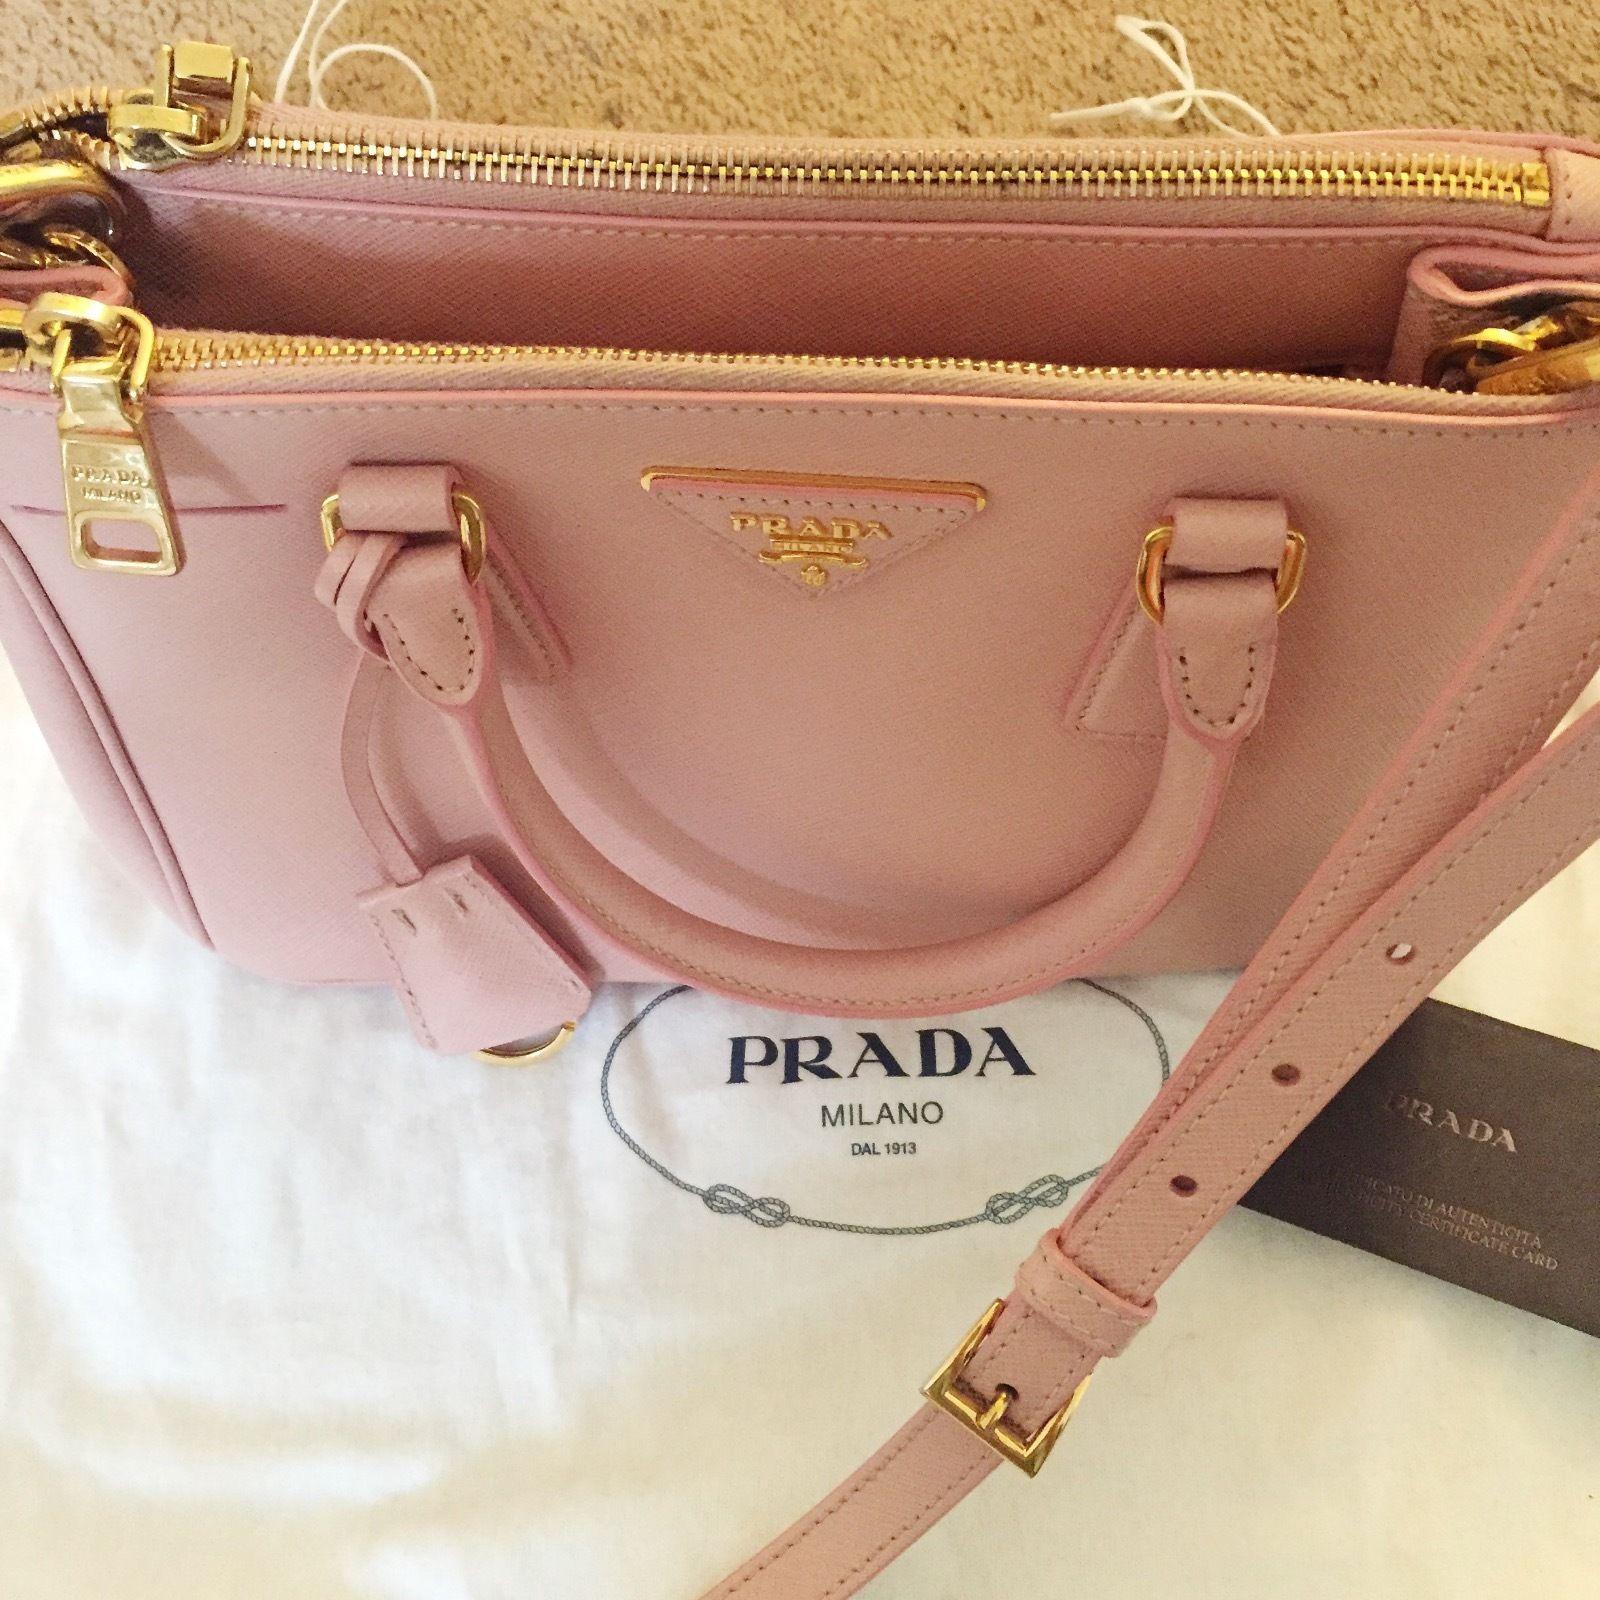 d1e384a5a50e Prada Saffiano Double-Zip Mini Crossbody handbag orchid pink | Prada ...